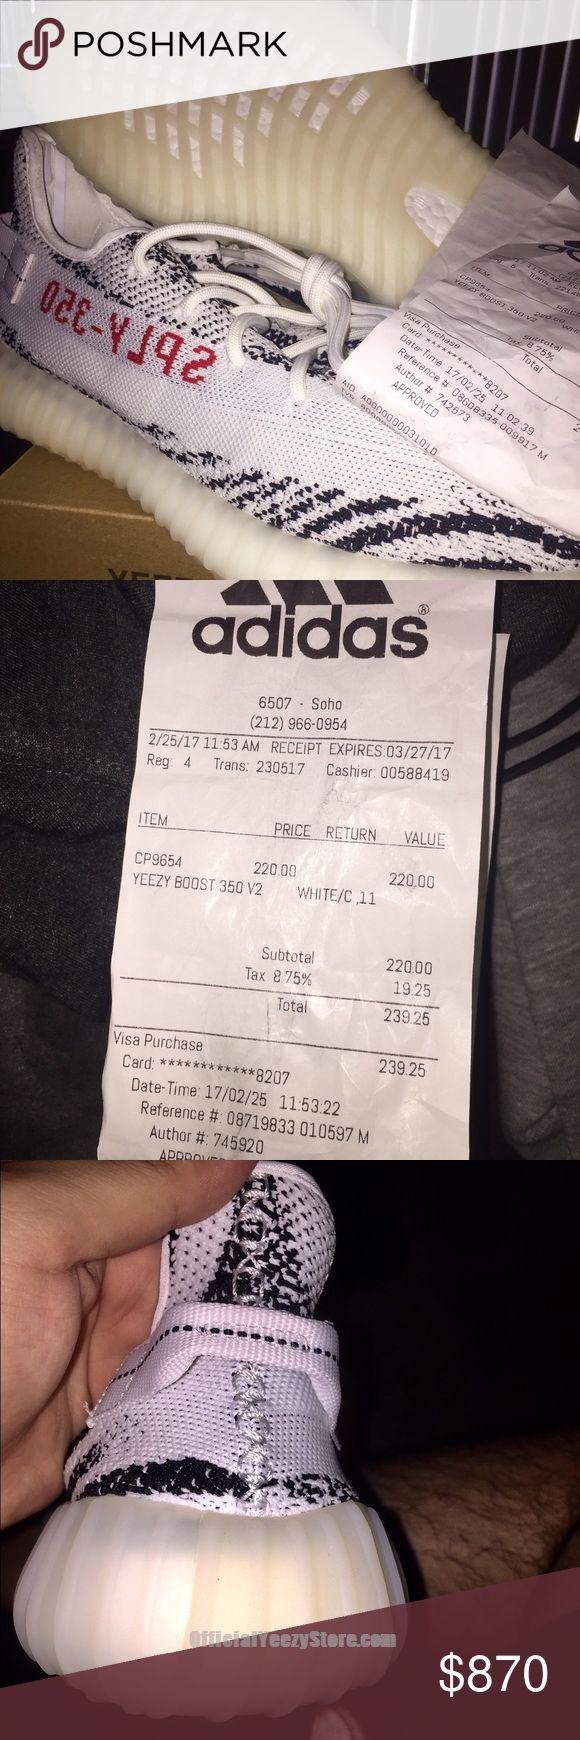 Adidas Yeezy Boost 350 V2 Zebra w/ Box and Receipt Priced to sell, in #yeezyboost350v2 #yeezyboost350v2zebra #yeezyboost350v2zebran #yeezyboostlabels #yeezyboost350beluga #yeezyboostmoonrock #lifestyle #gym #nicekicksnmd #freshkicksfriday #nicekicksallday #sneakerheaduk #sneakerheadproblems #nicekicksyeezyboost #sneakerheadsbelike #sneakerheadz #sneakerhead4life #sneakerheadrush #kicksonfìre #sneakerheadcartel #kicksonfirestl